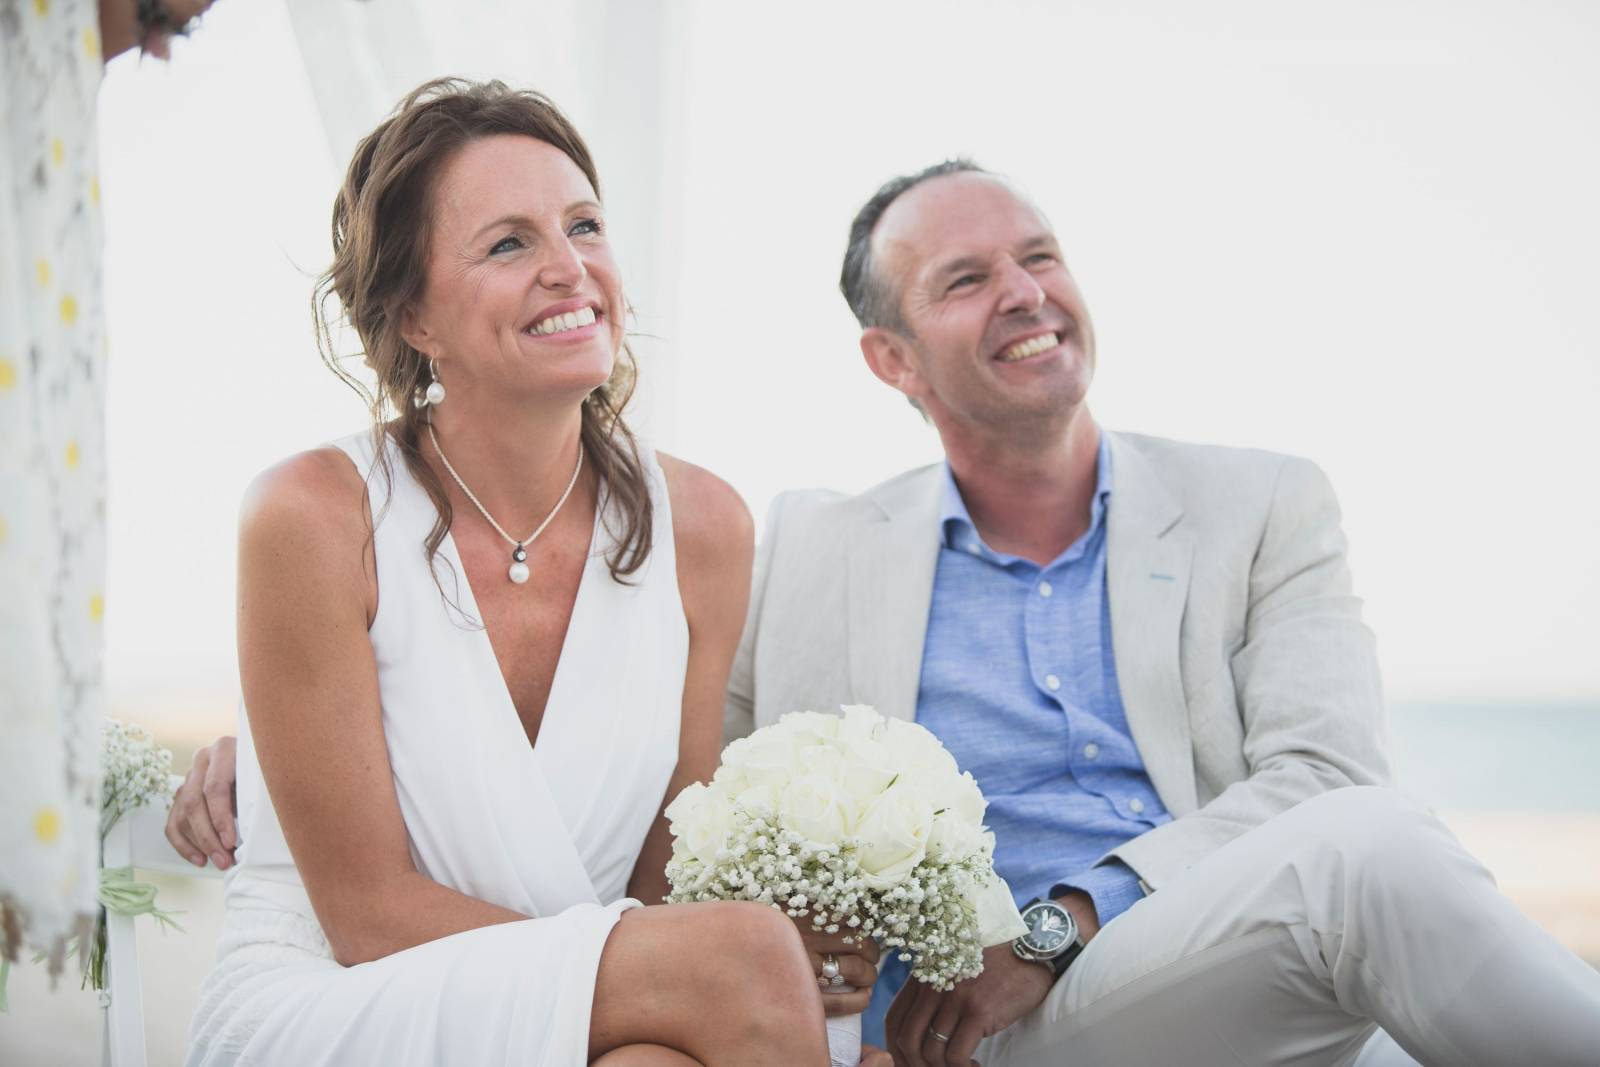 Live 4 Love - Ceremoniespreker - House of Weddings - 15